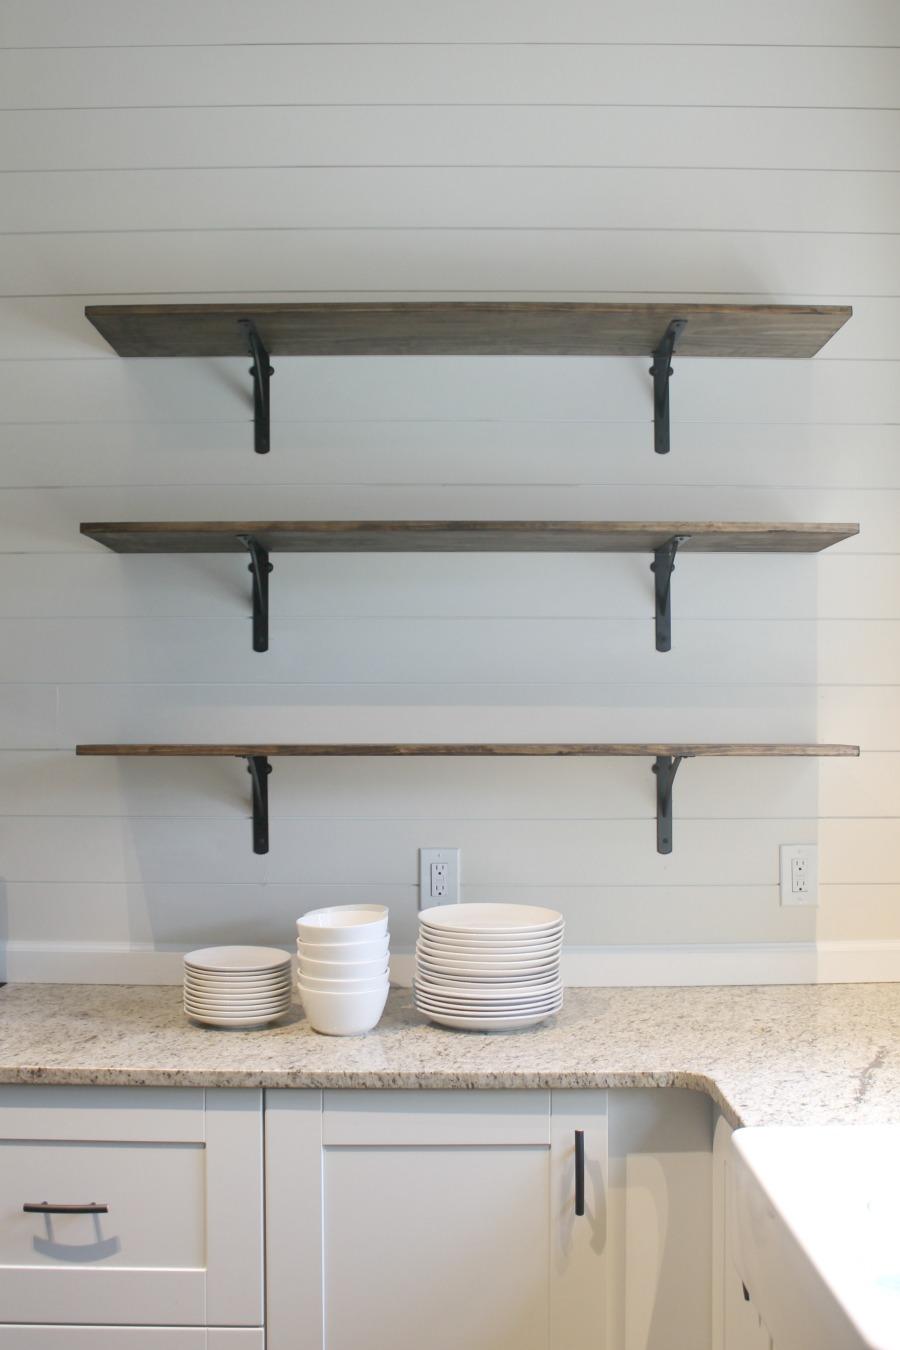 DIY Kitchen Shelves for Under $100 [How To] - Life Storage Blog